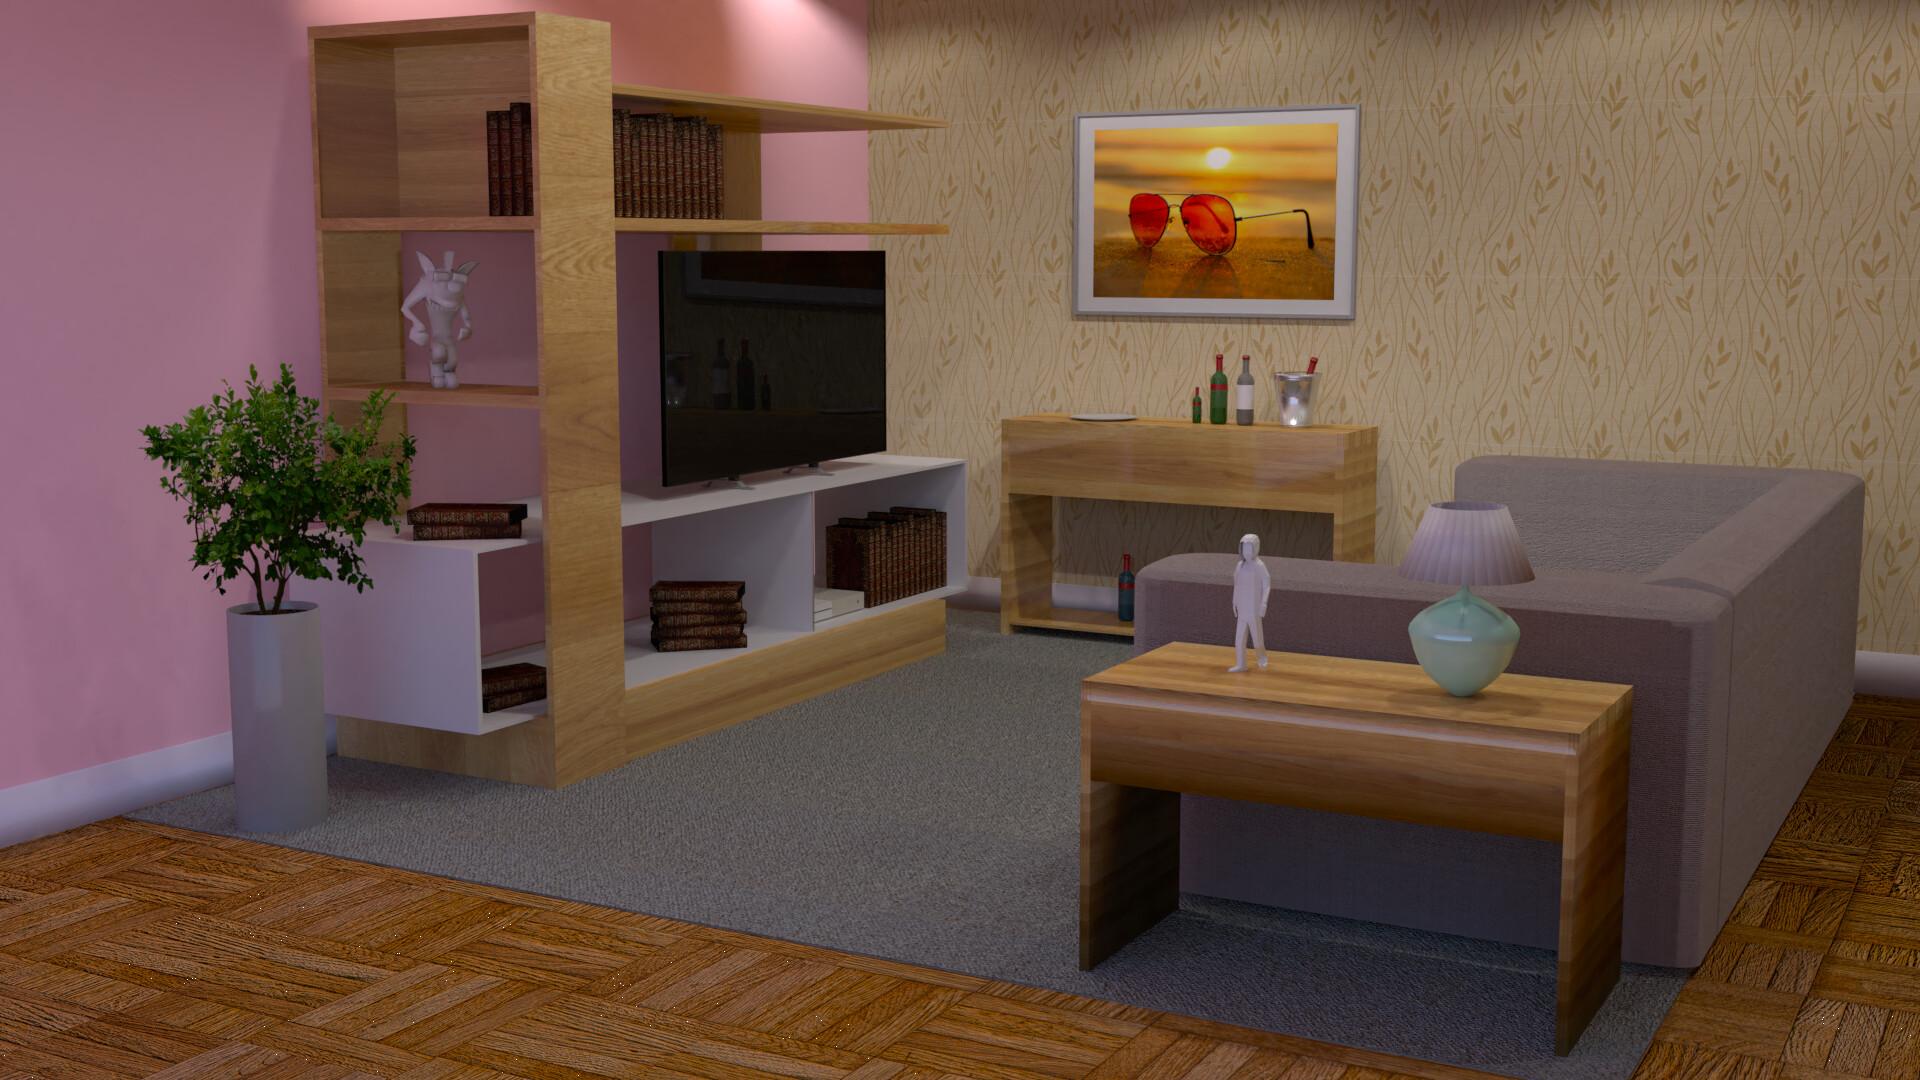 Tiago Melo - Living room and mini bar